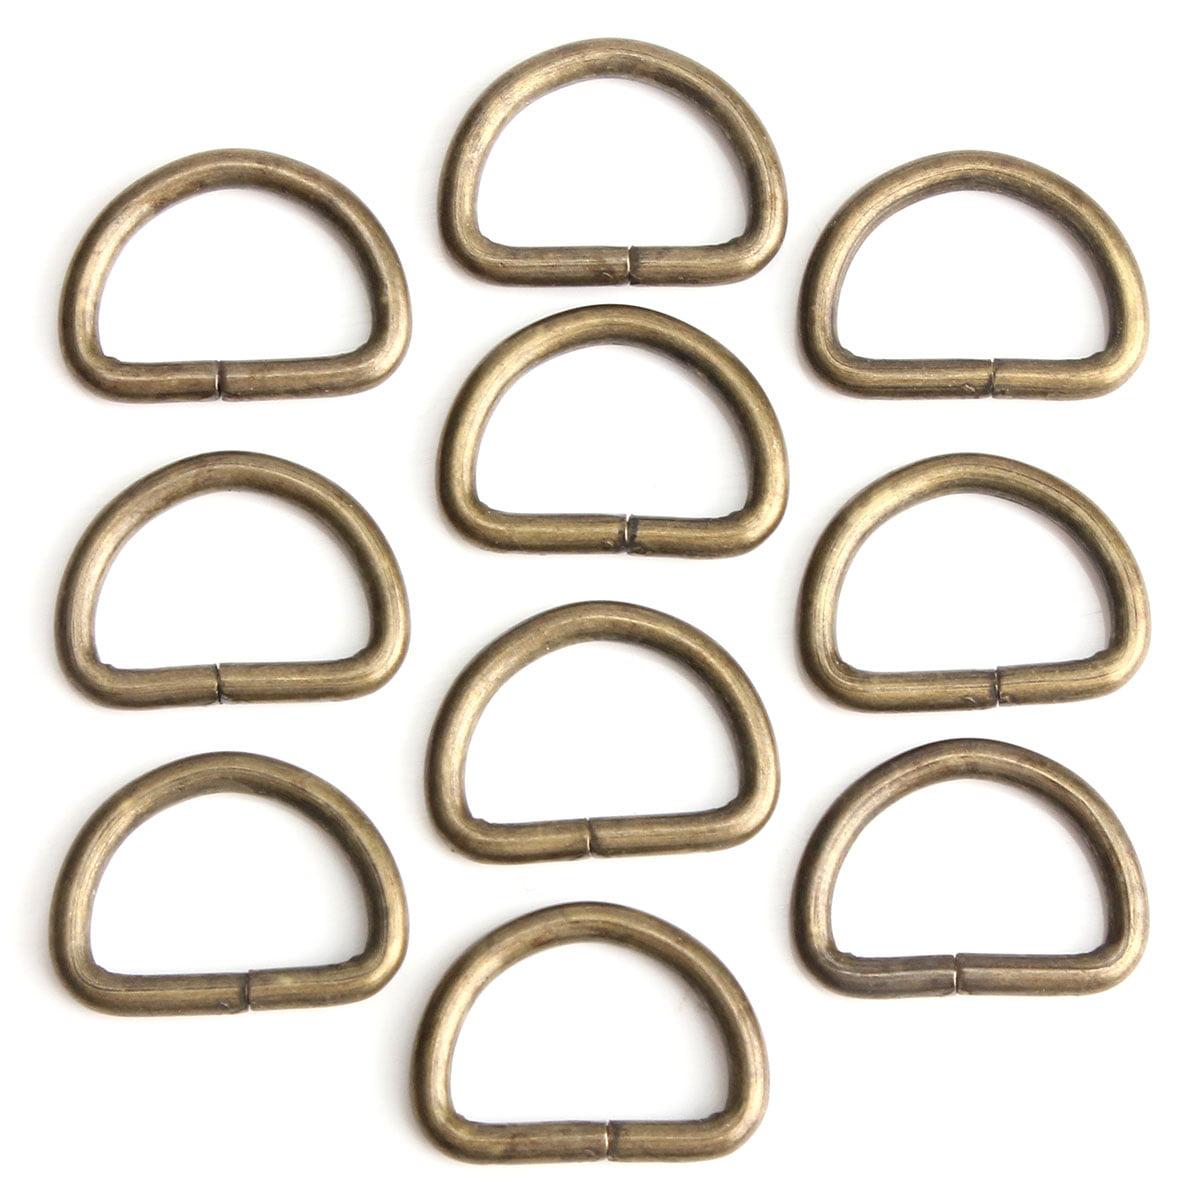 10Pcs 15mm Metal D Shaped Ring Buckle for Webbing Hand Bag,Cinnamon